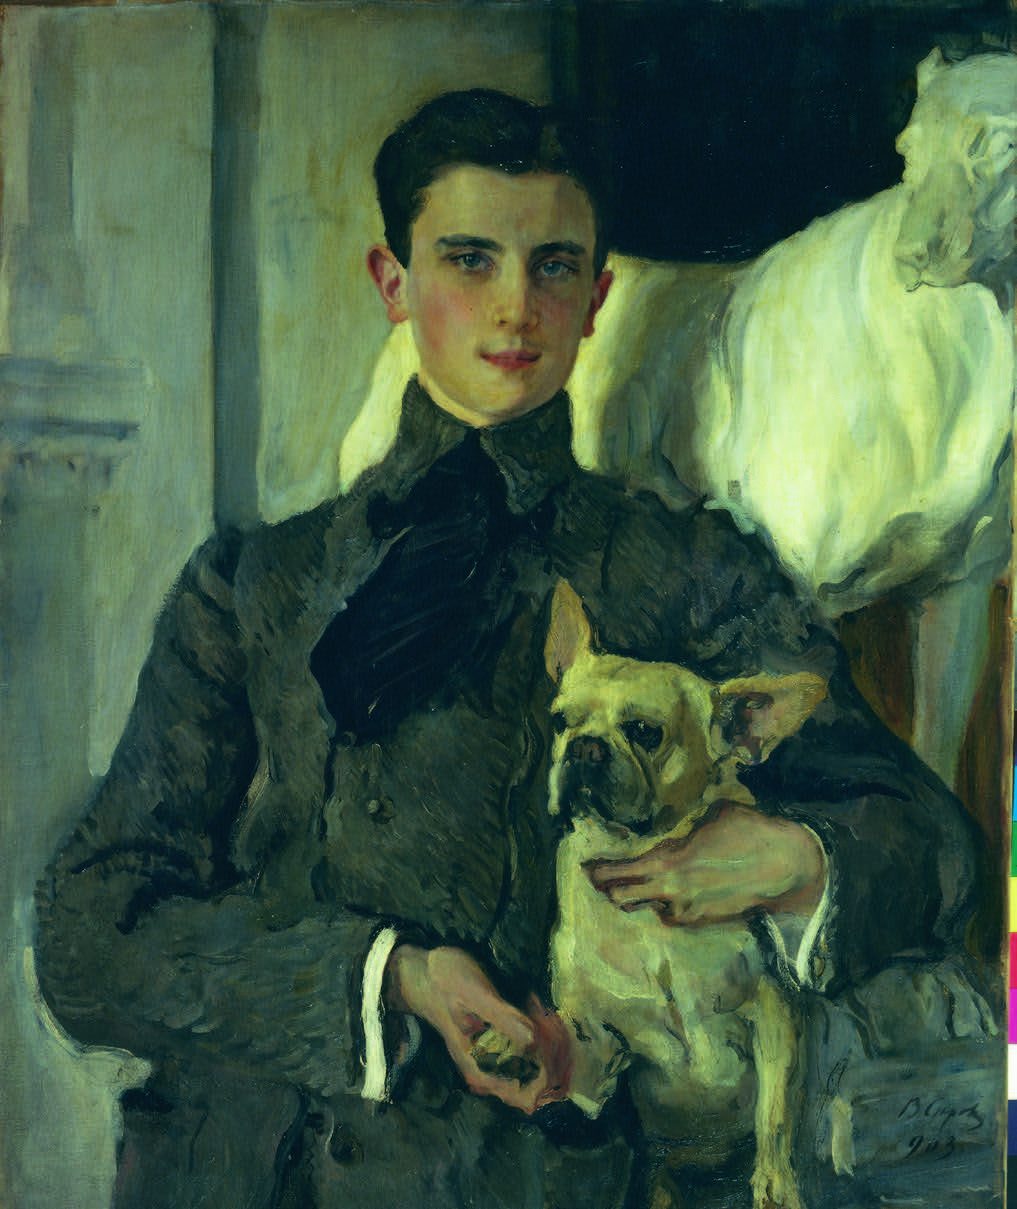 Valentin Serov (1865-1911), Portret van graaf Feliks Feliksovich Sumarokov-Elston (1887-1967), 1903, Staats Russisch Museum, St. Petersburg